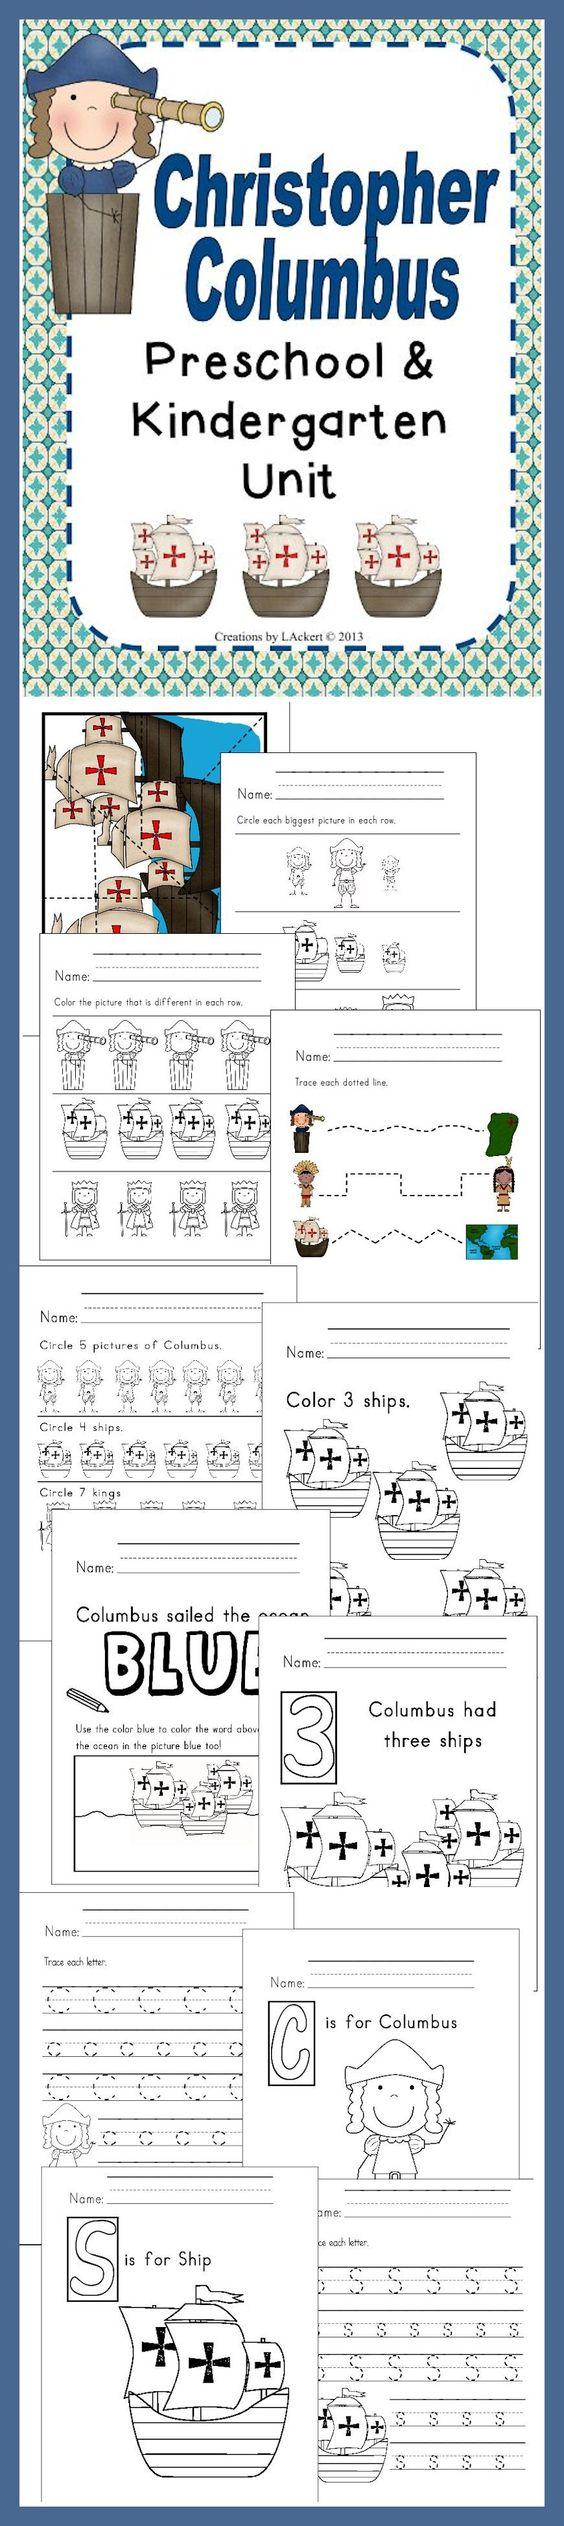 math worksheet : christopher columbus kindergarten unit that includes different  : Kindergarten Homeschool Worksheets